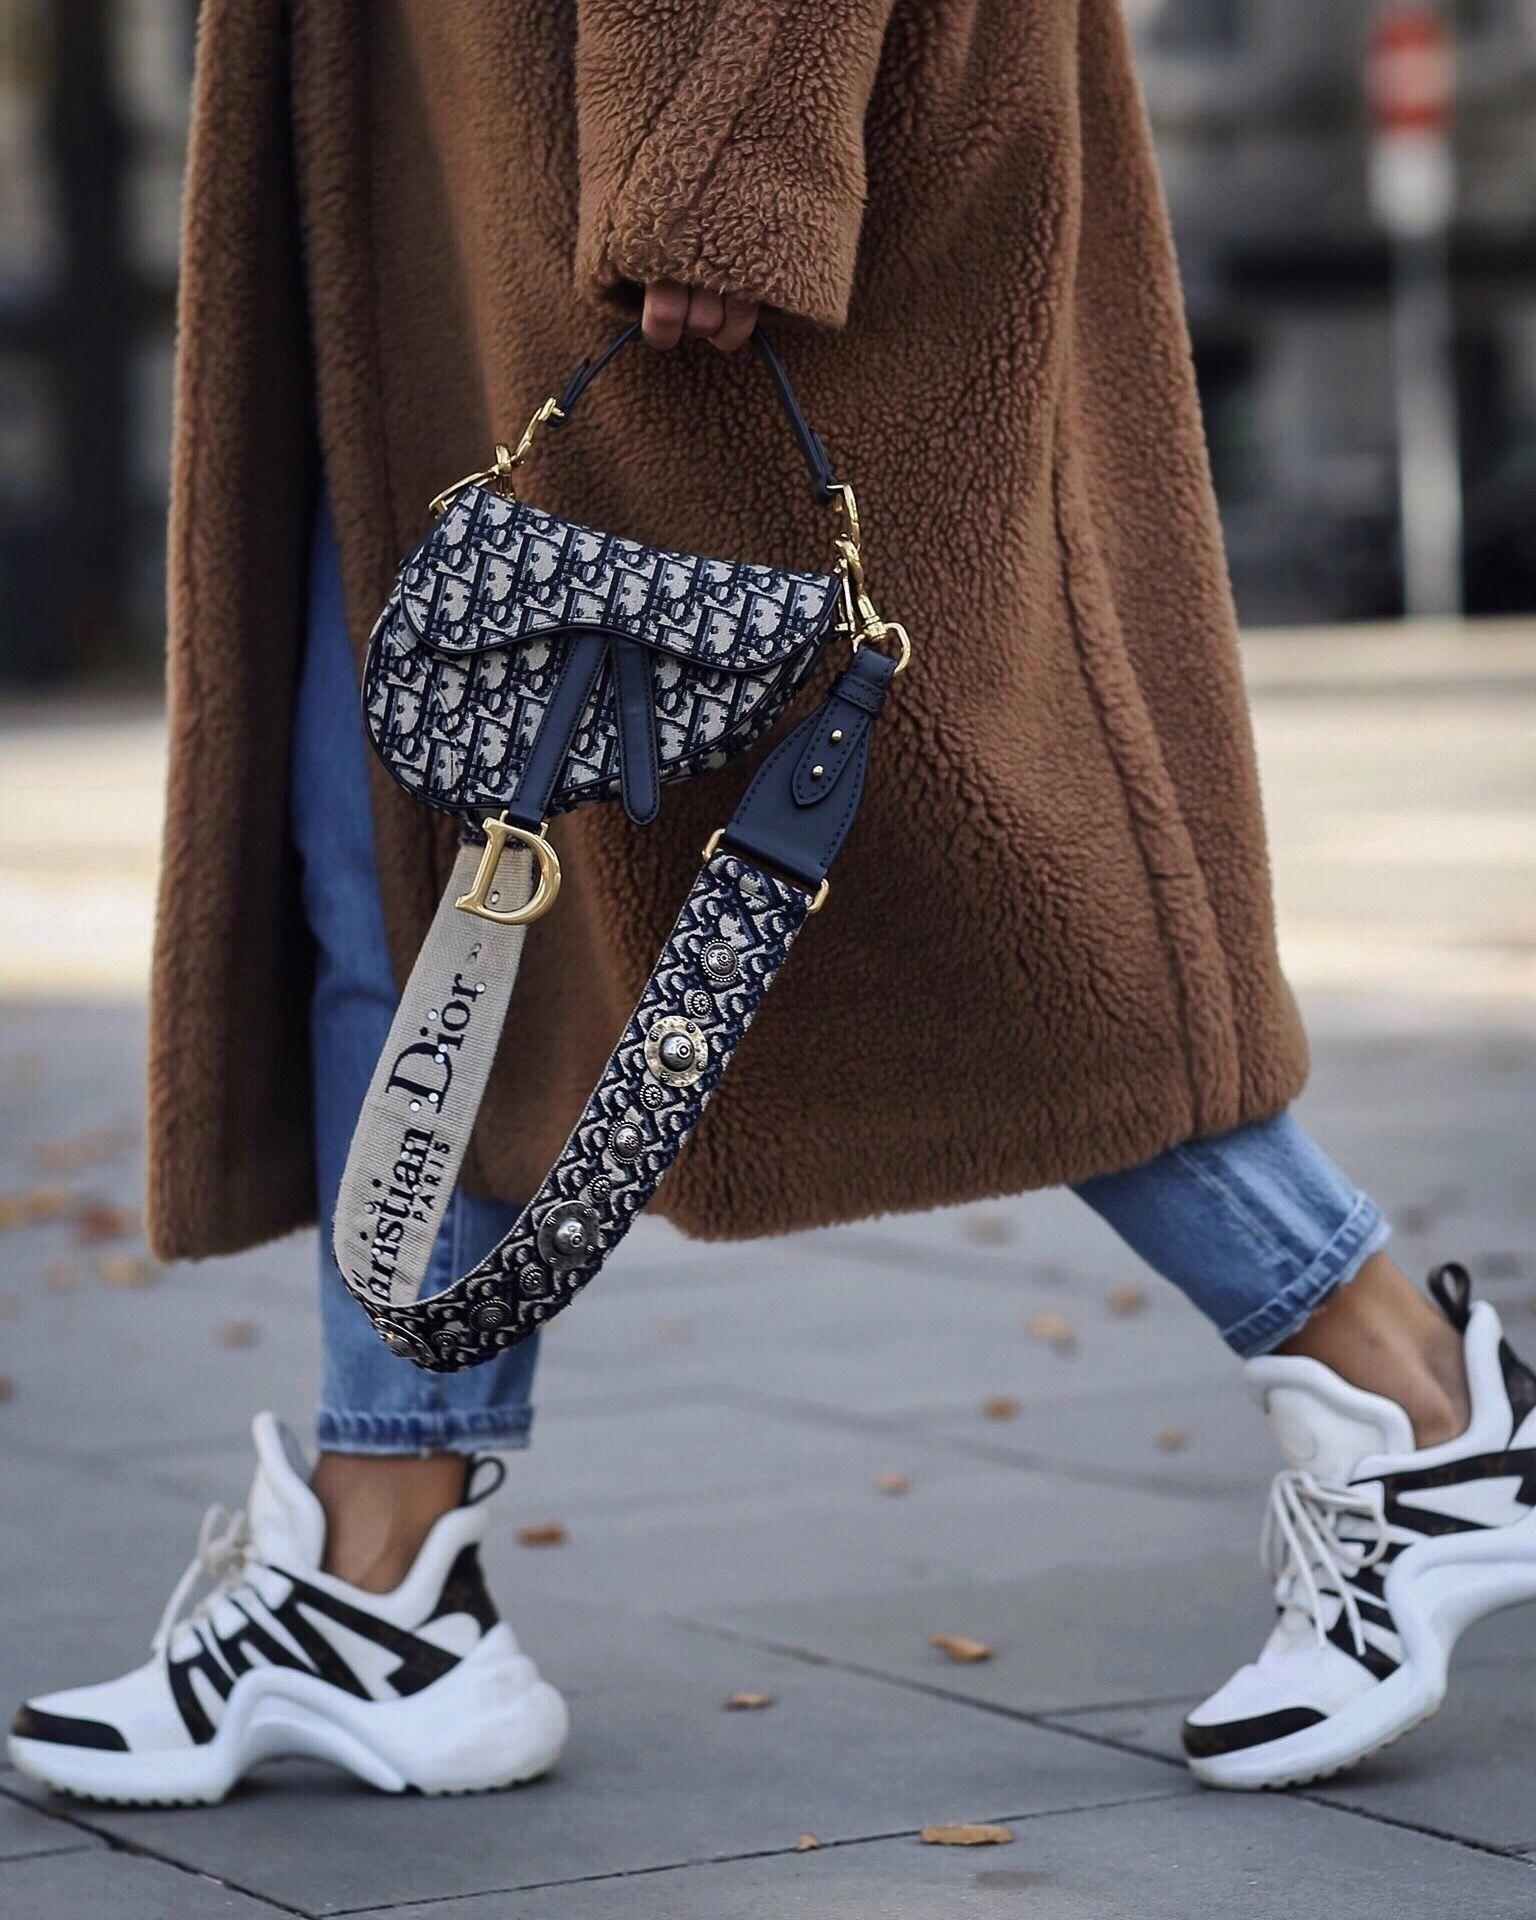 fef1ca52671e Dior saddle bag | Louis Vuitton Archlight Sneaker | max Mara teddy coat  #urbanstreetstyle